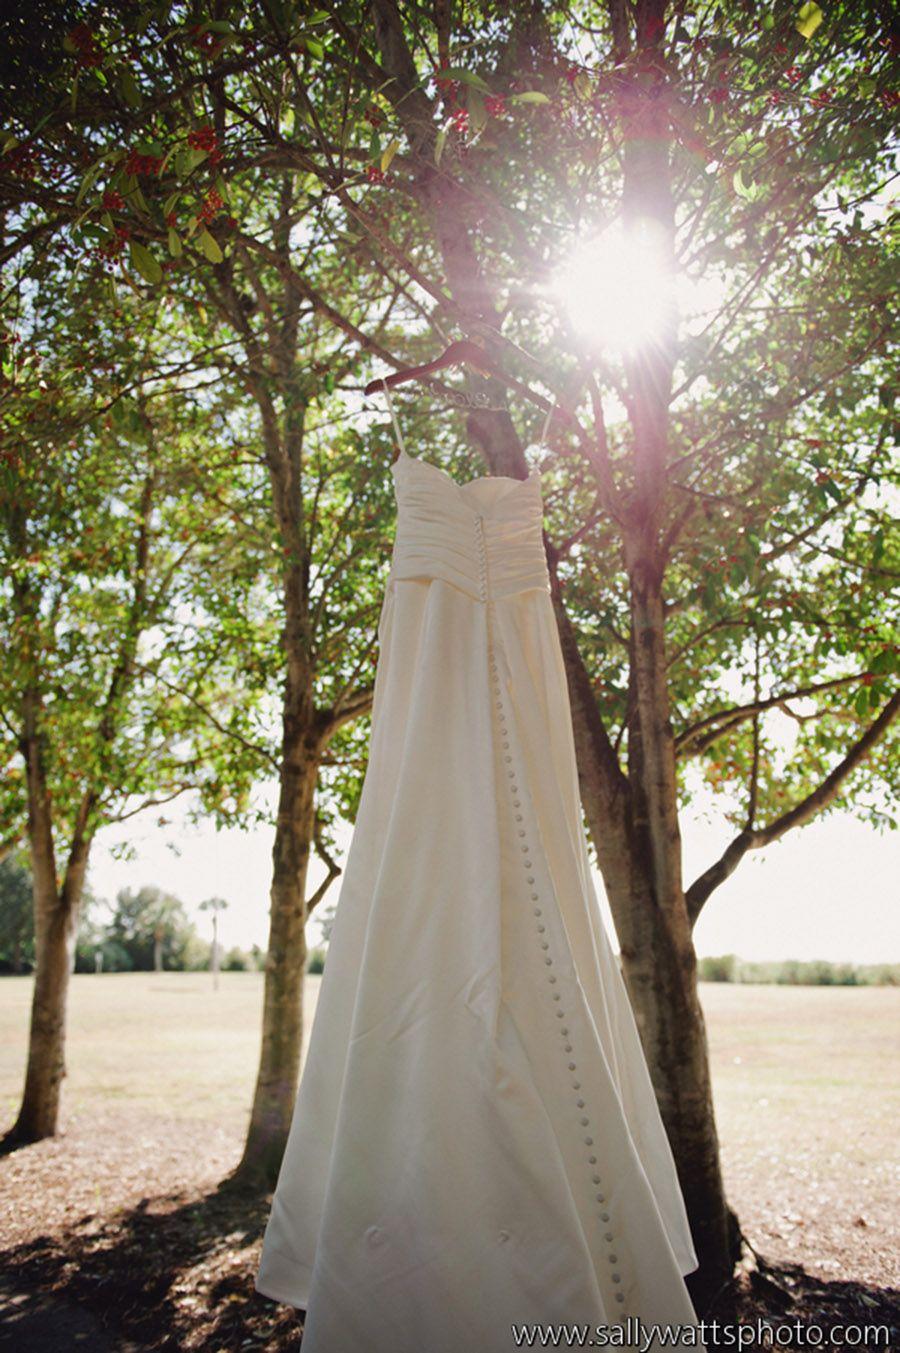 Wedding decorations inside church  photo idea for dress  Hunting Themed Wedding  Pinterest  Wedding